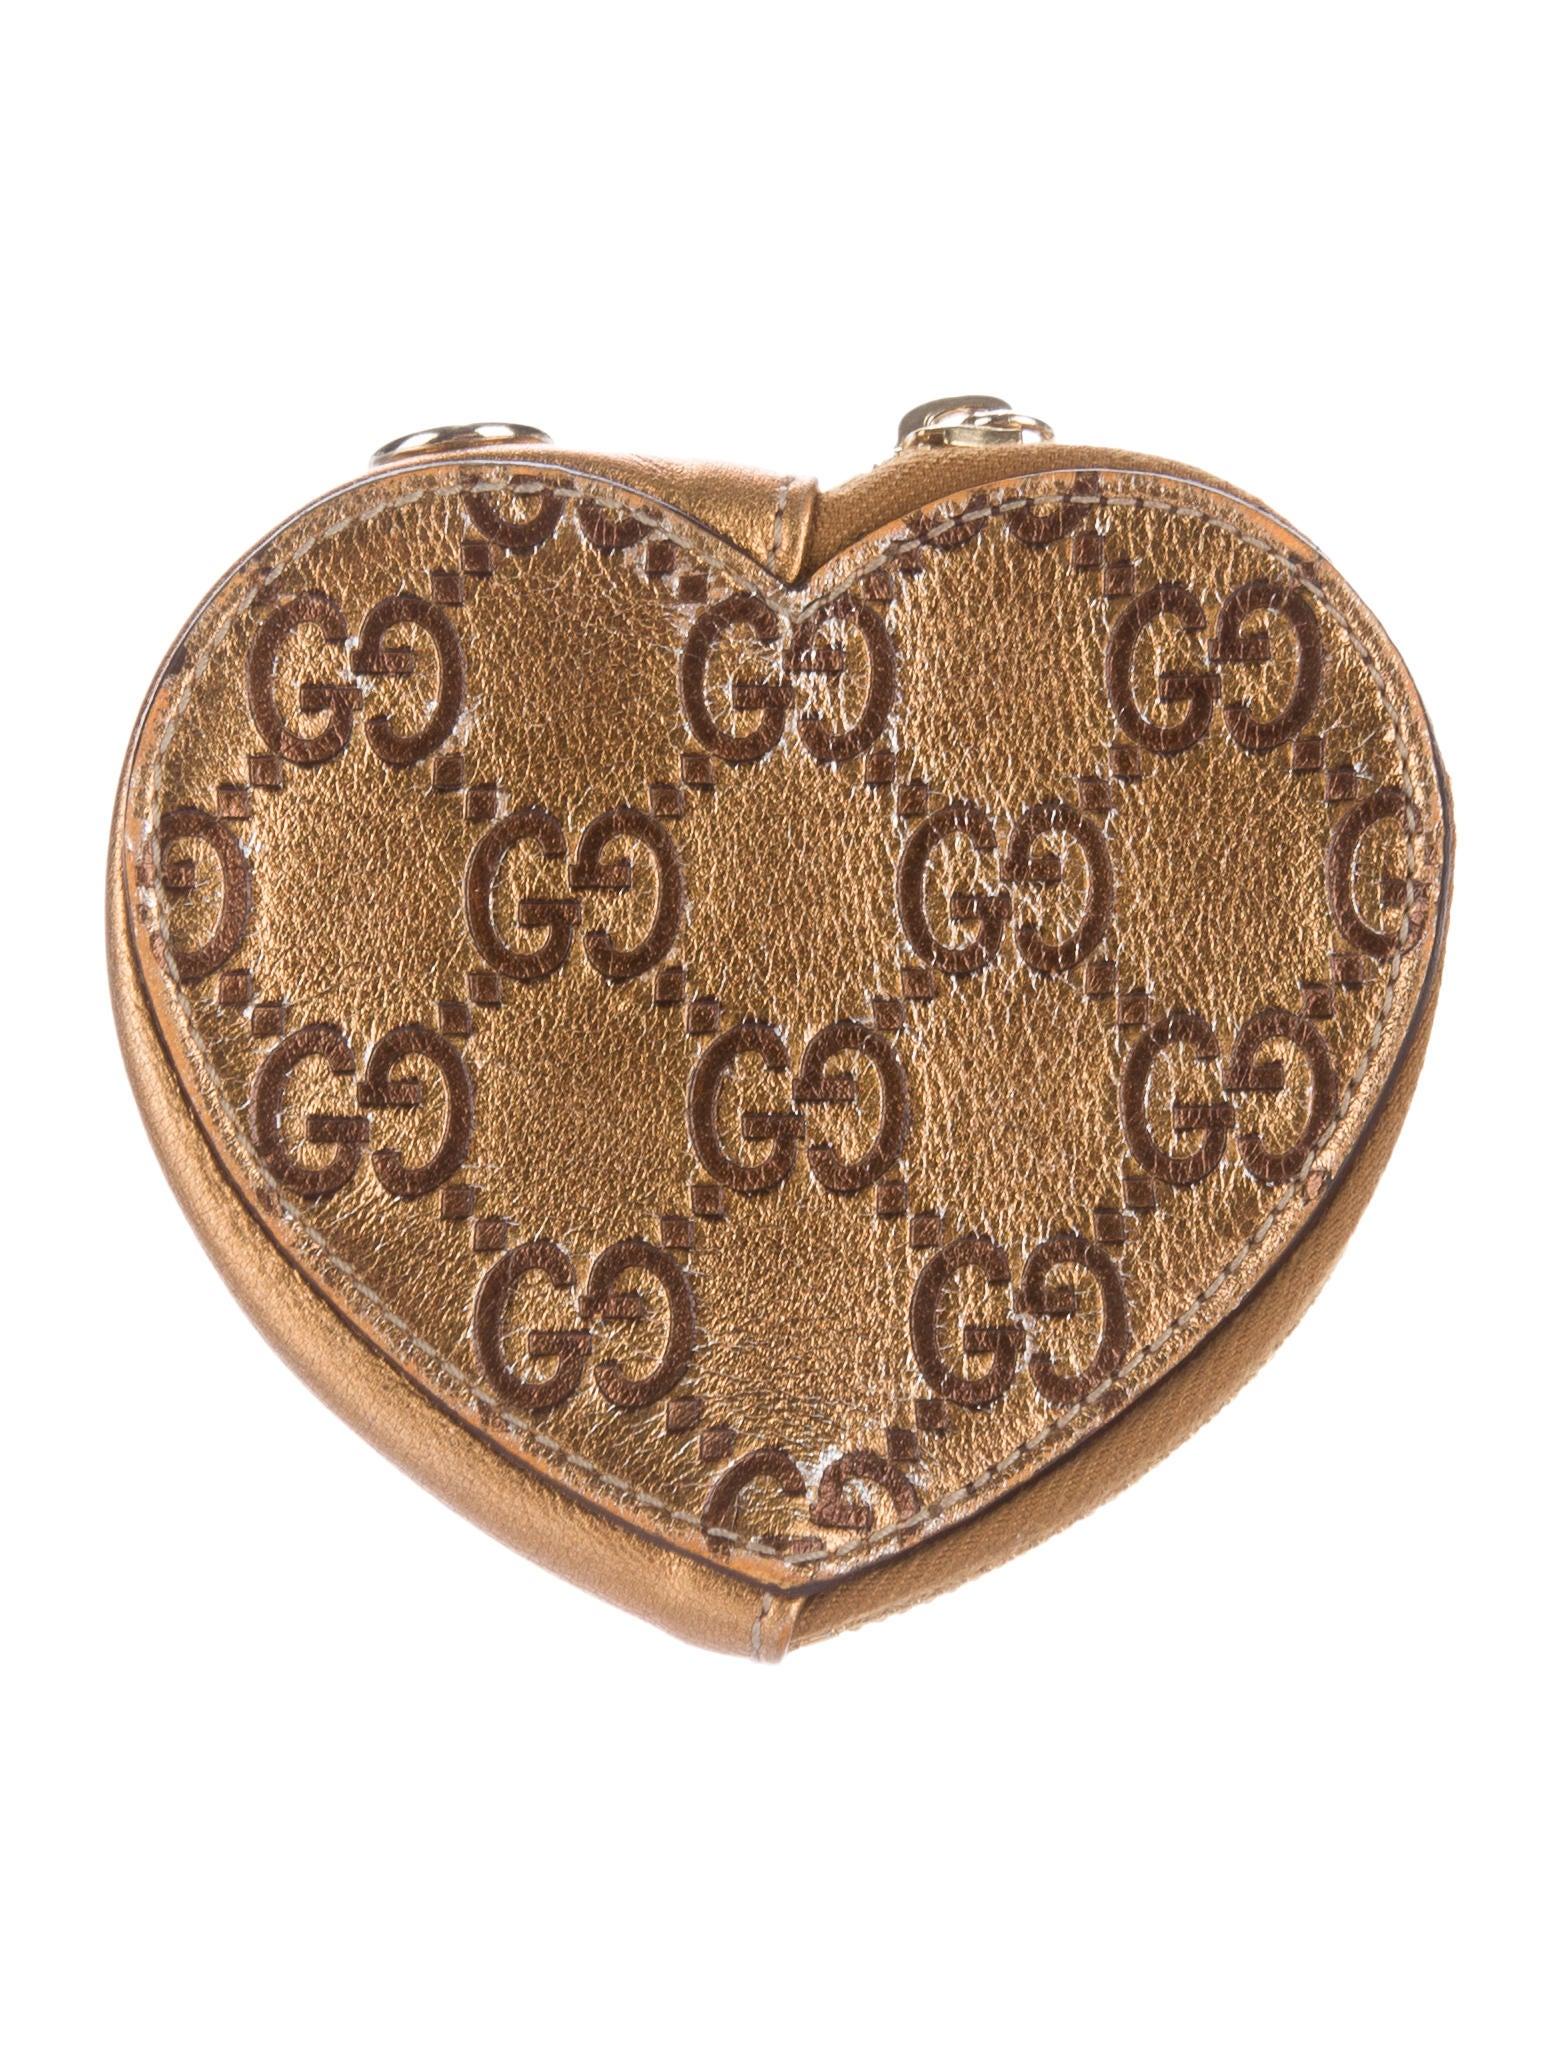 2a0efdb8eac Gucci Guccissima Heart Coin Purse - Accessories - GUC143874